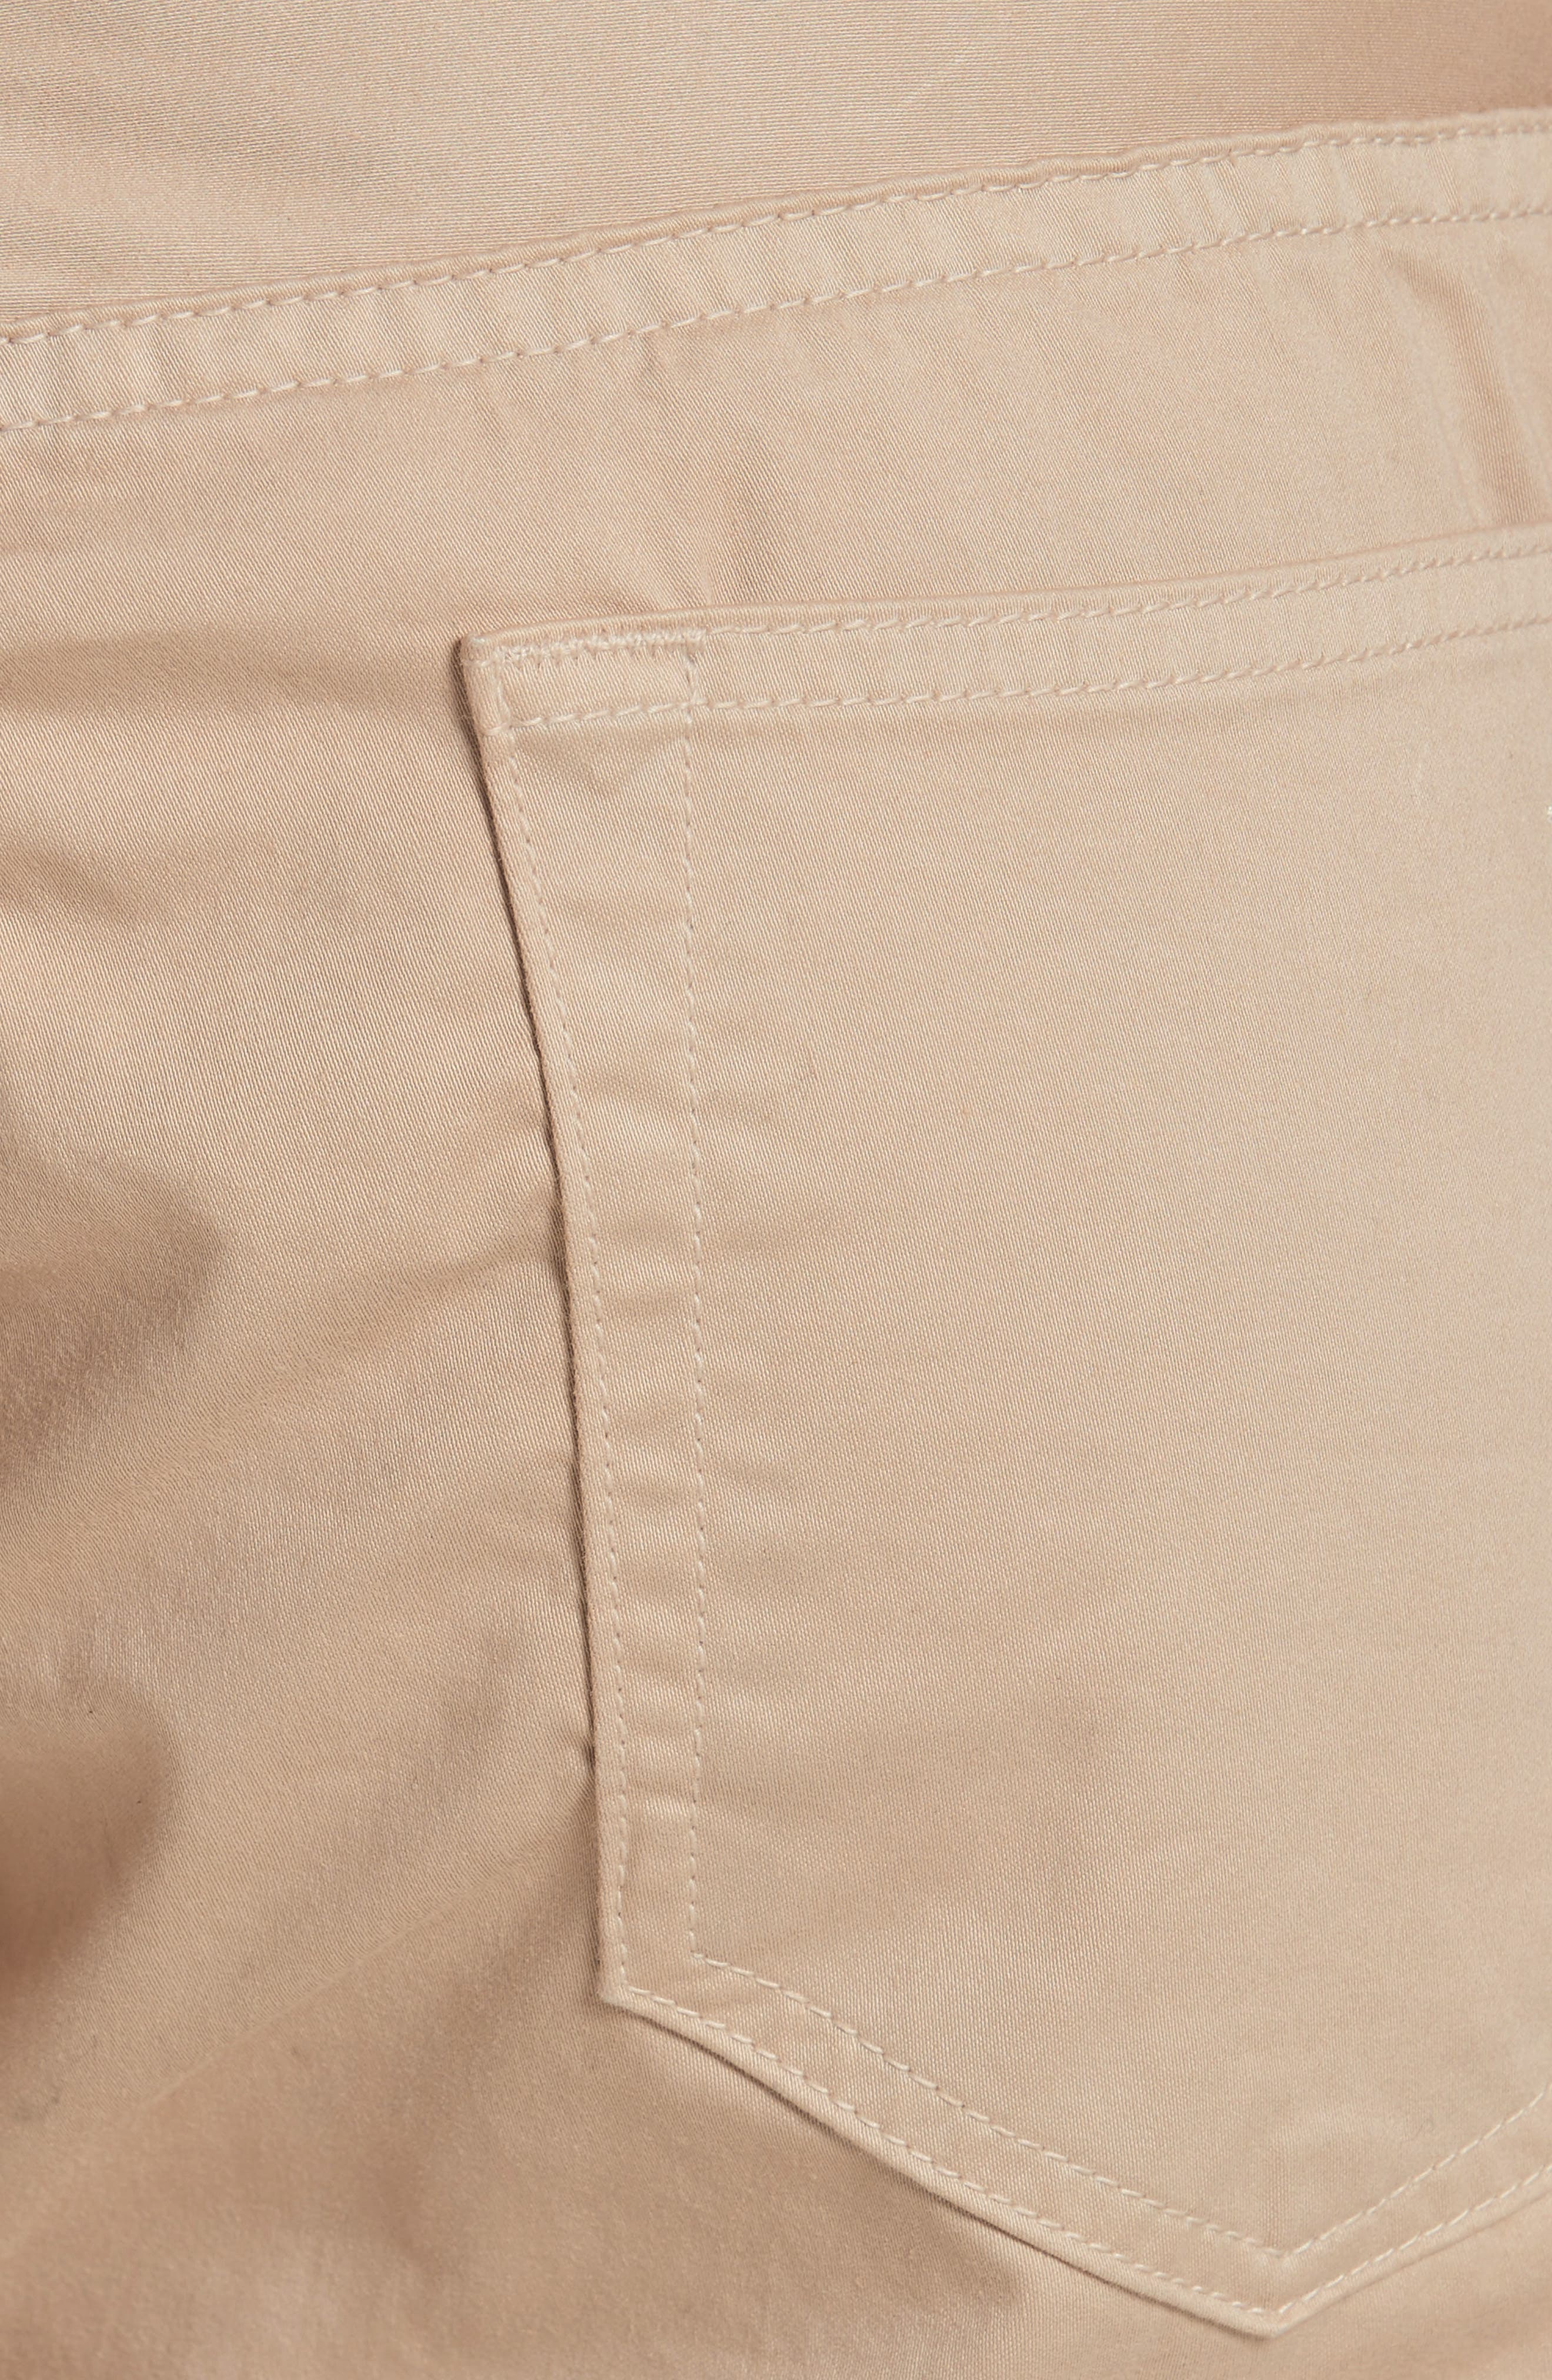 Fit 2 Five-Pocket Twill Pants,                             Alternate thumbnail 5, color,                             BEIGE